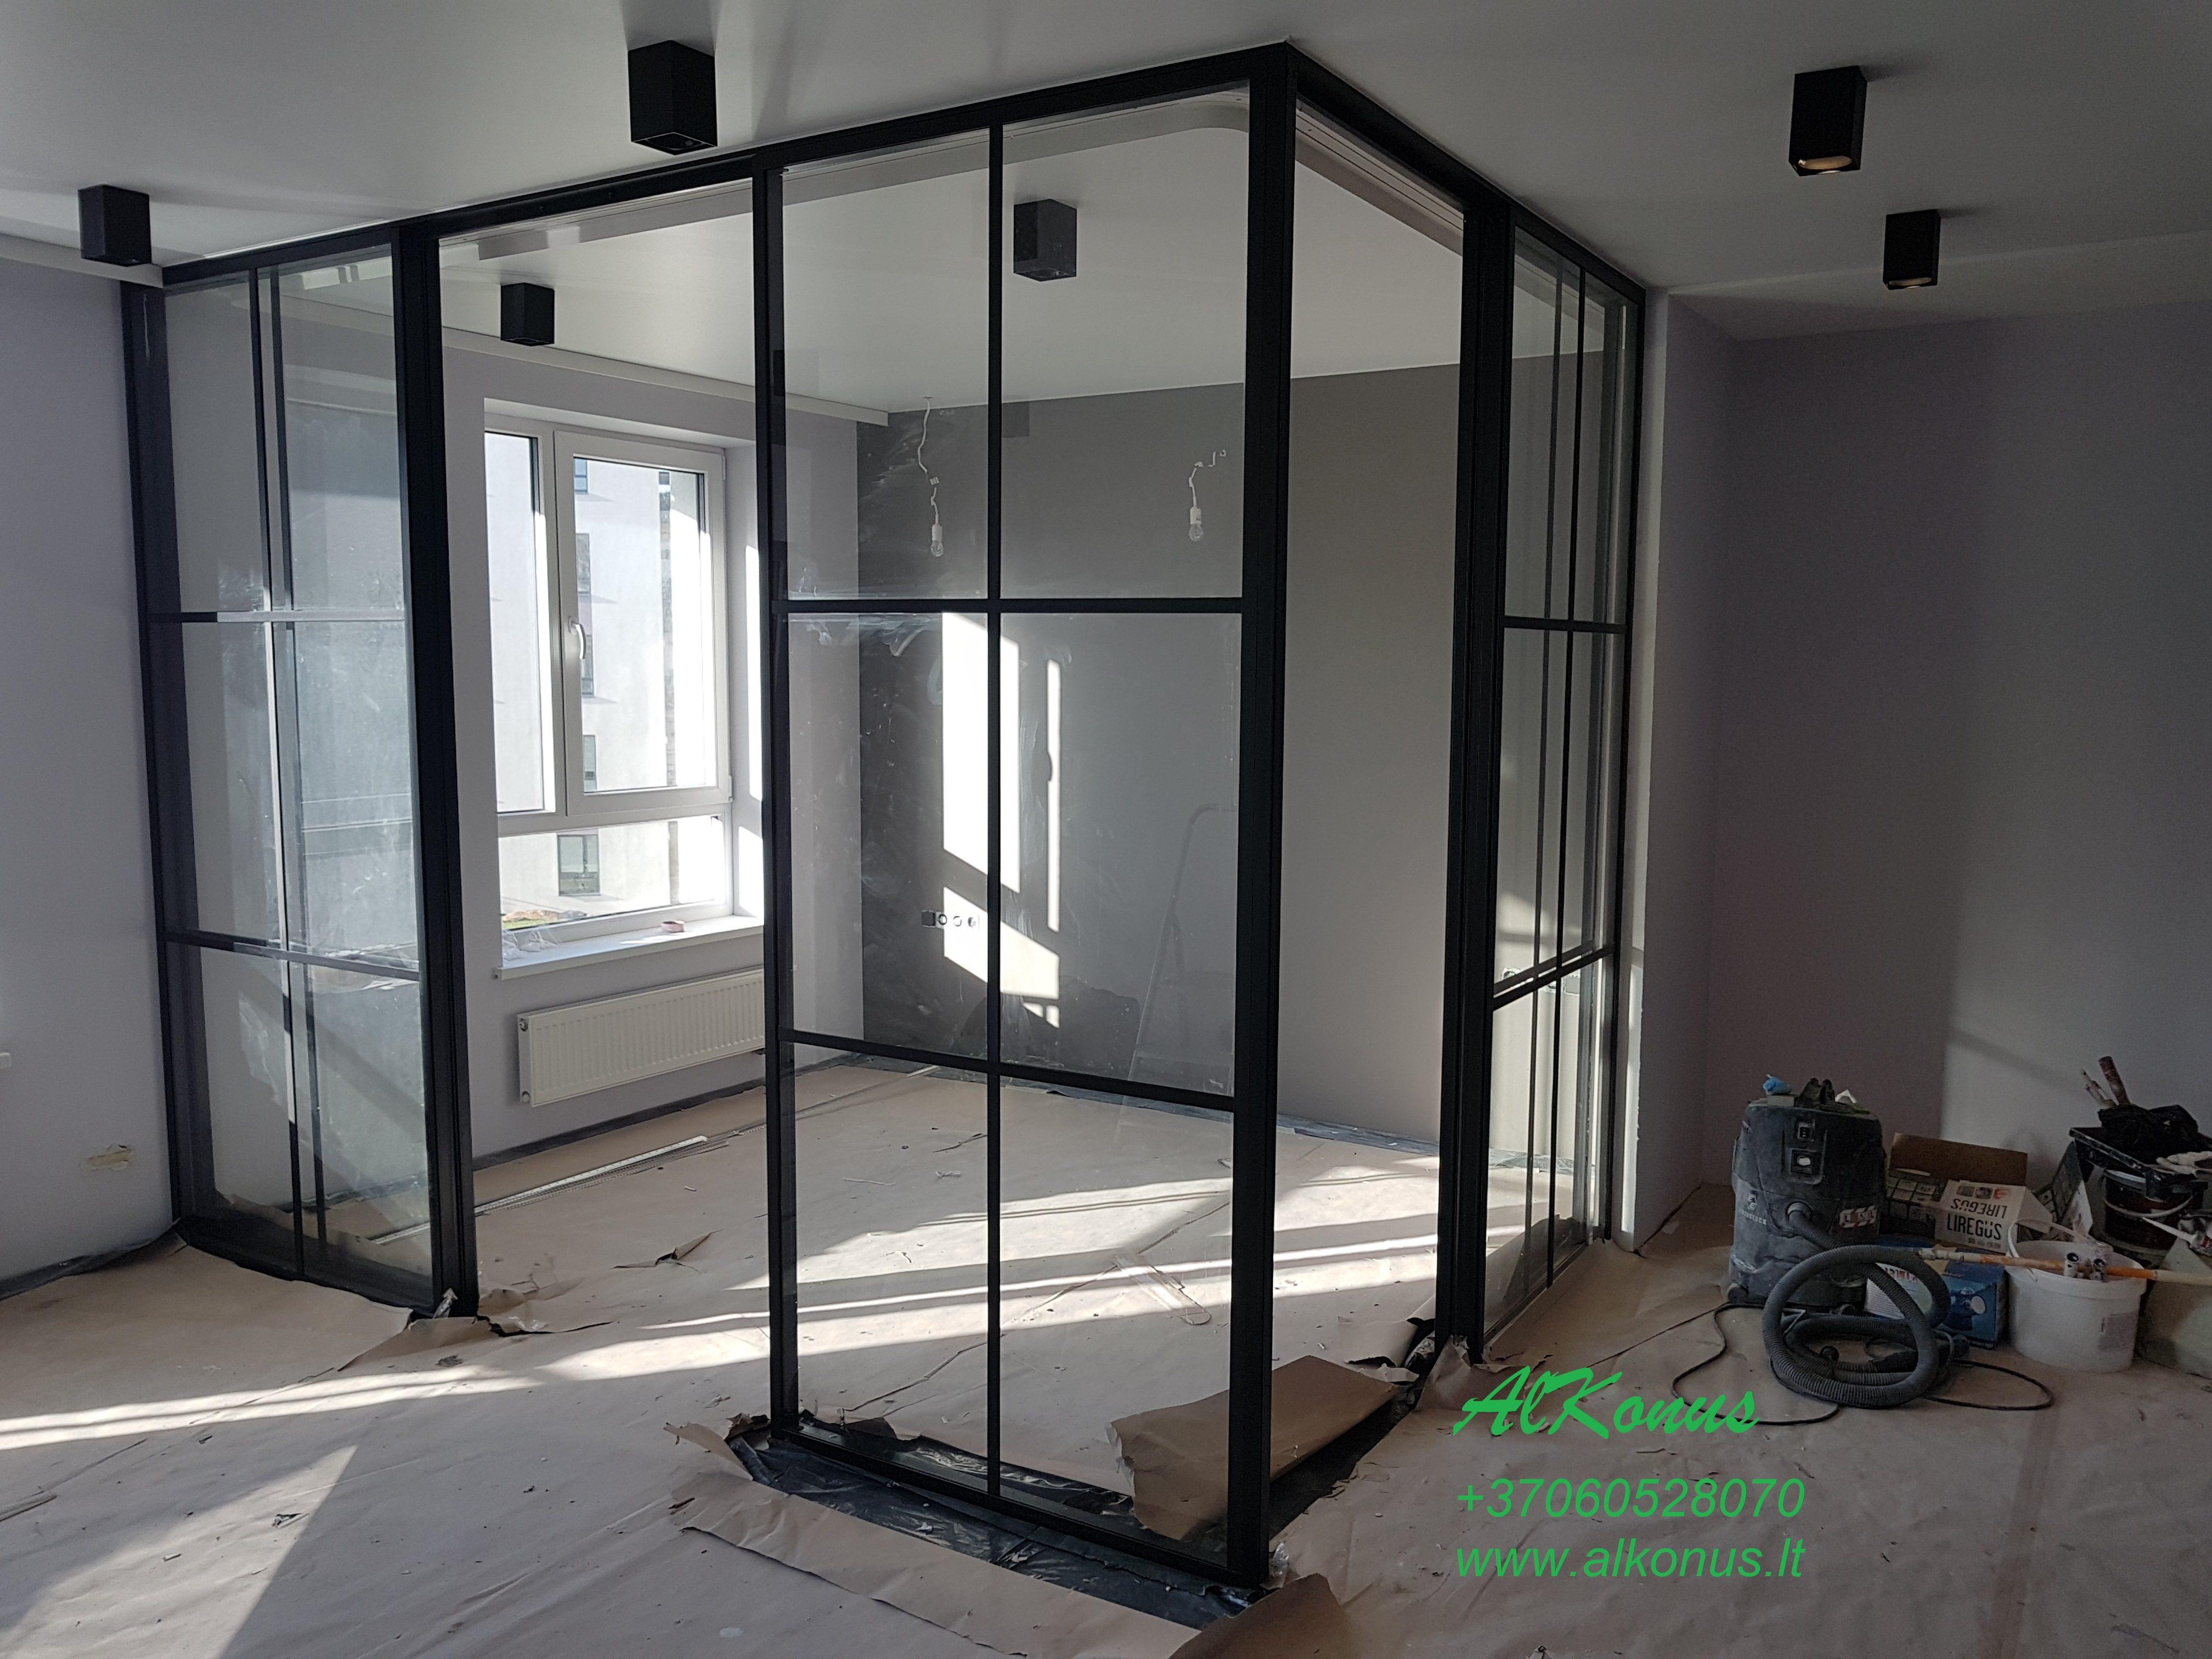 stiklo baliustrados sistemos glazgas)